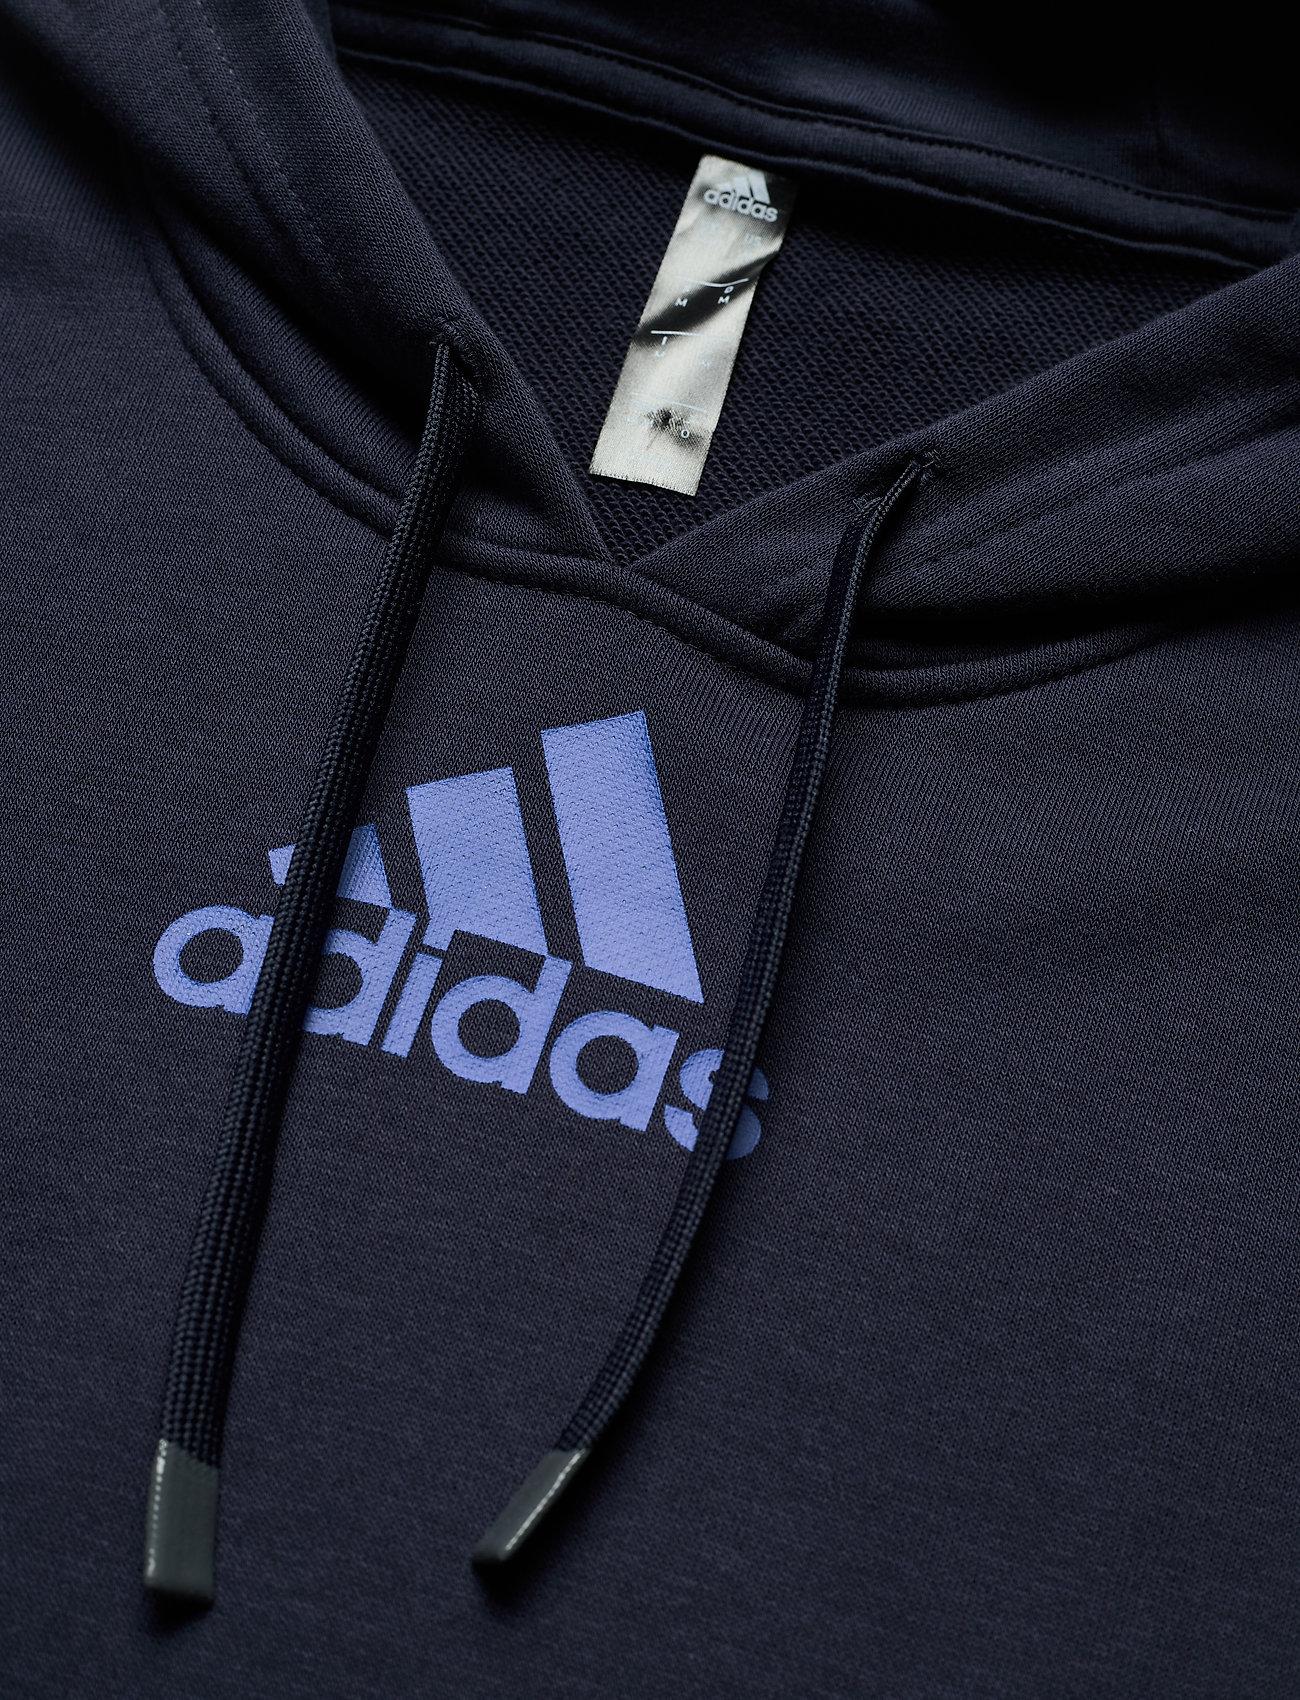 adidas Performance TENNIS CATEGORY GRAPHIC HOODIE - Sweatshirts GREY - Menn Klær